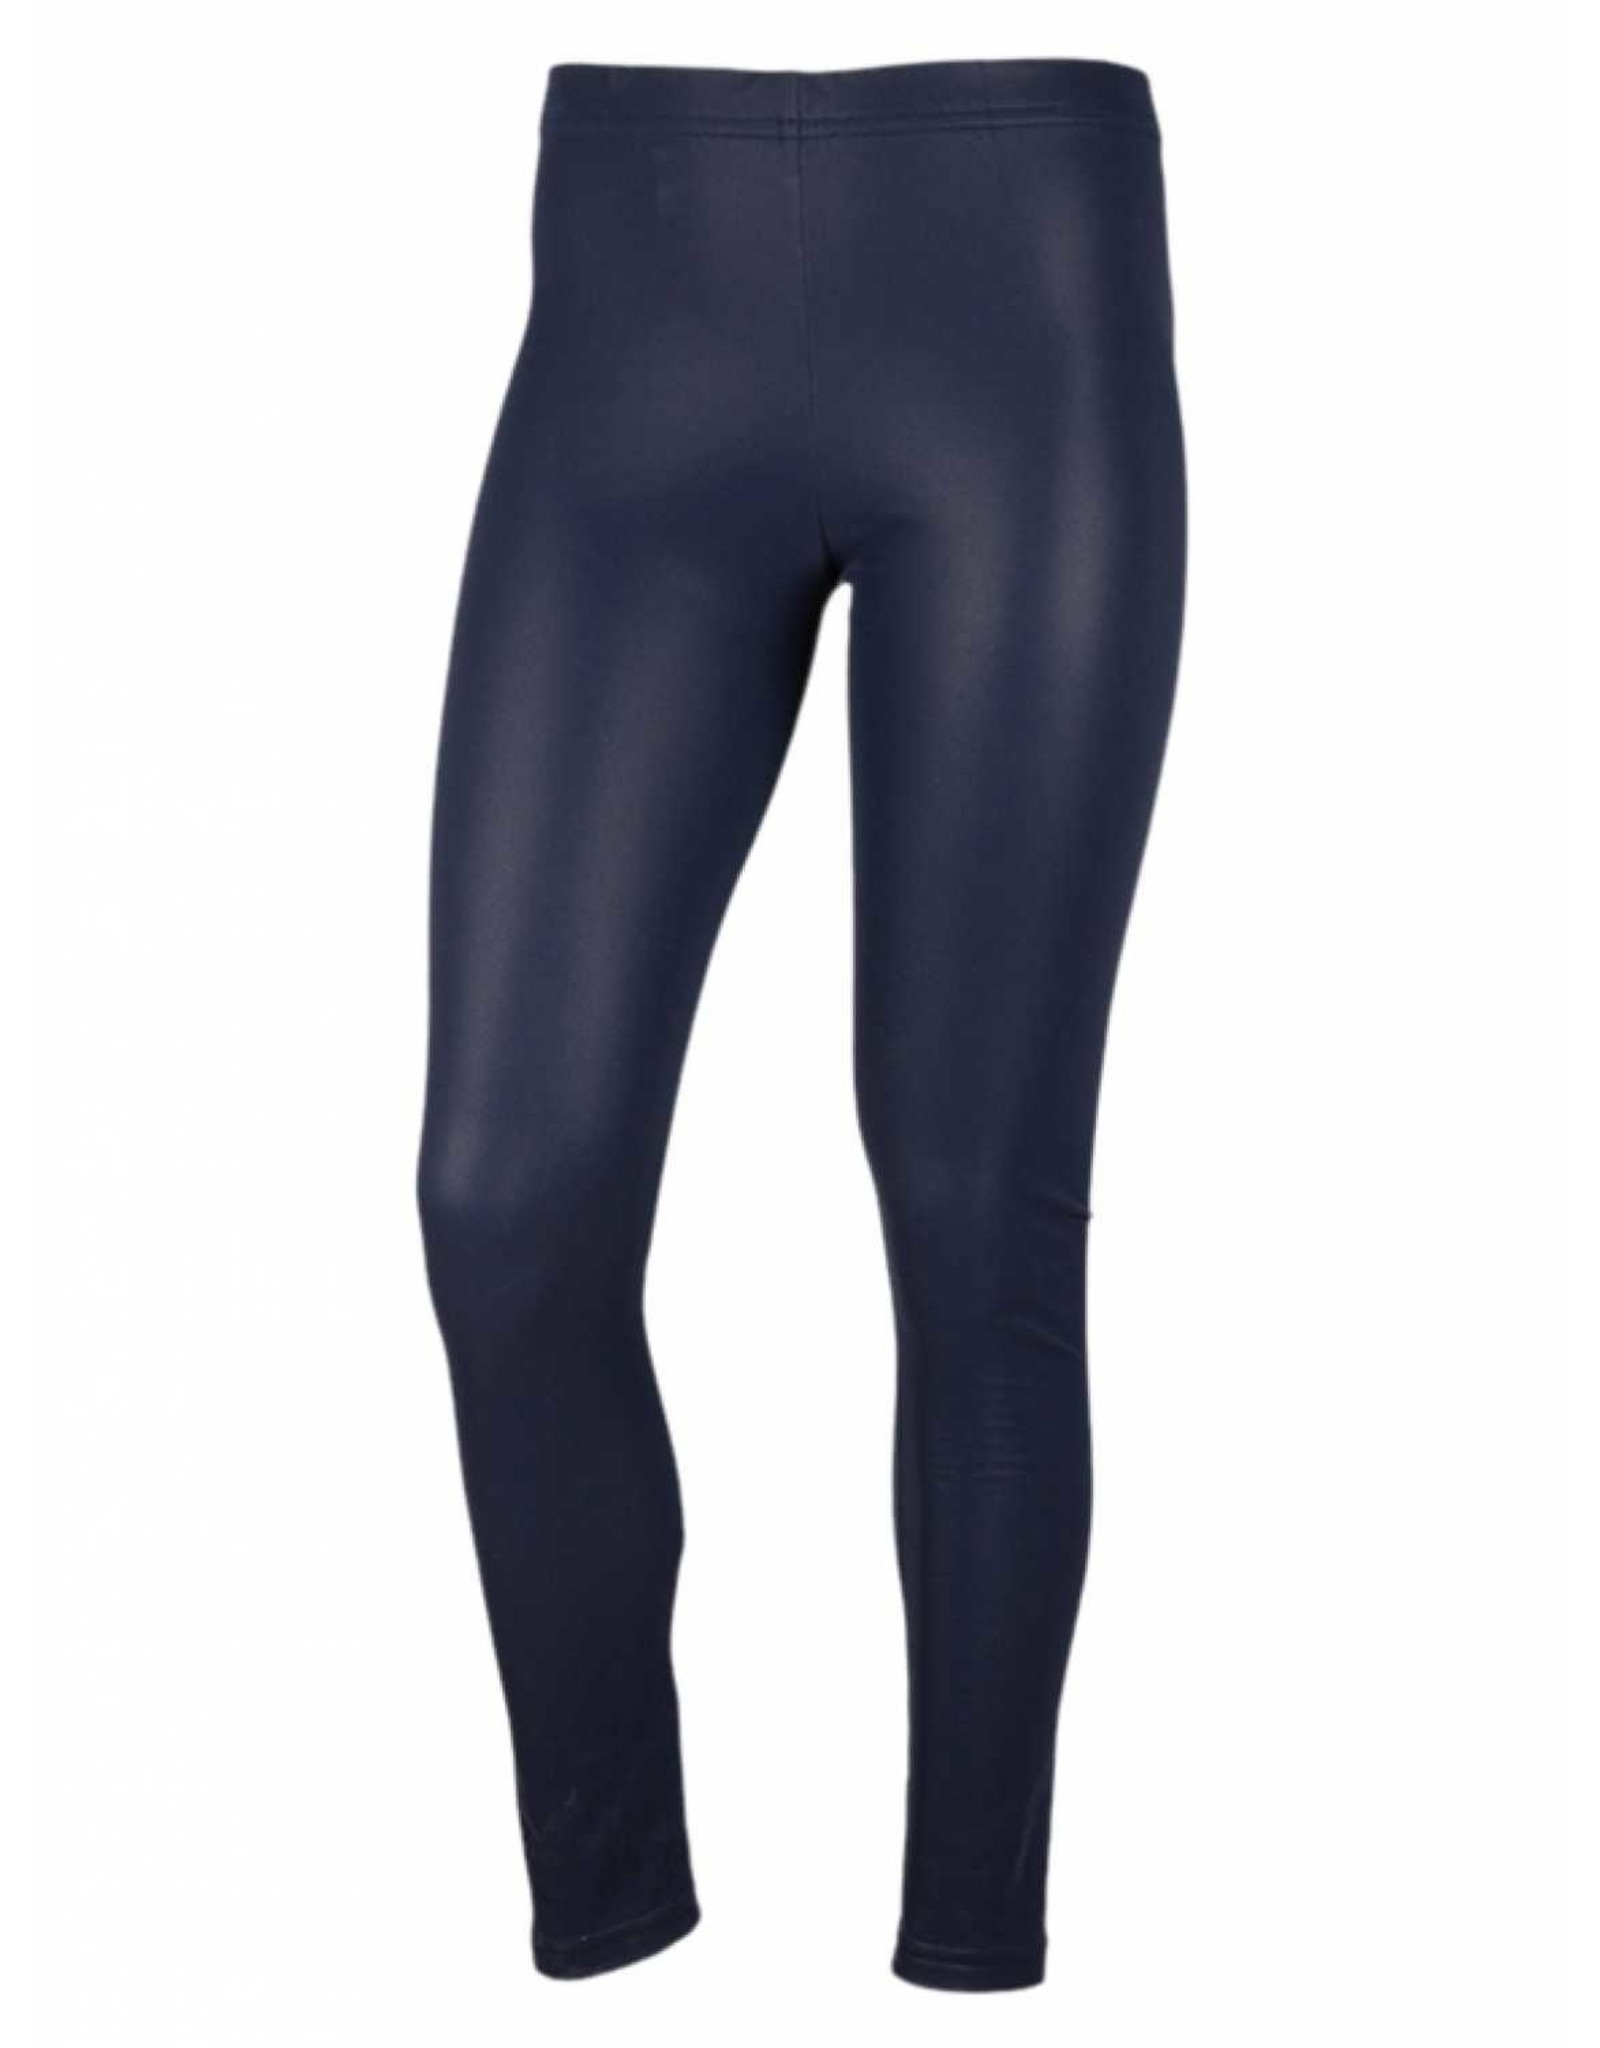 Kie-stone legging